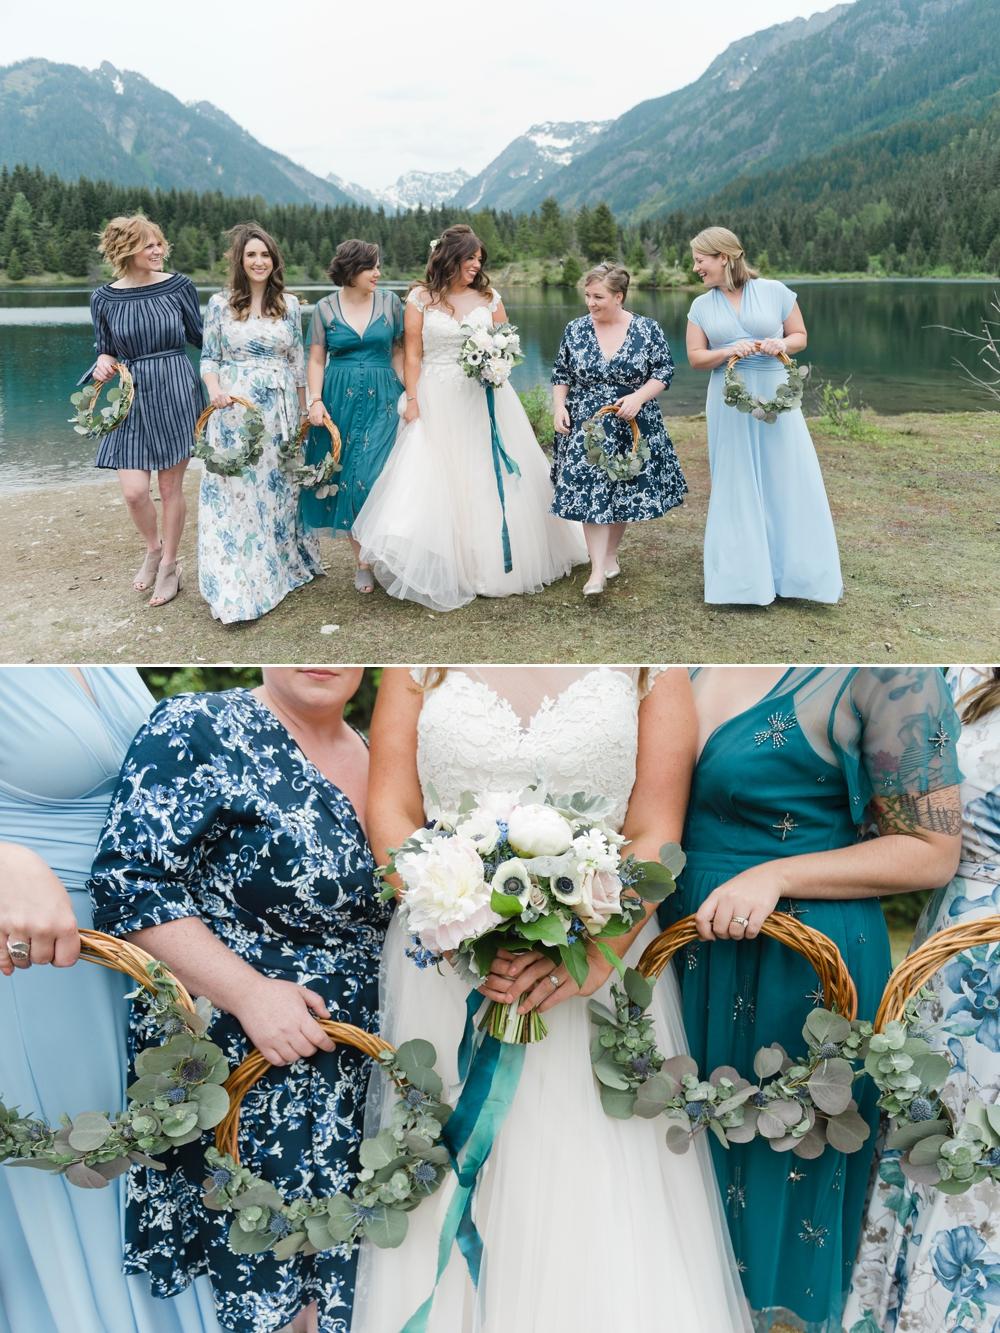 gold-creek-pond-snoqualamie-pass-wedding-photographer-27.jpg